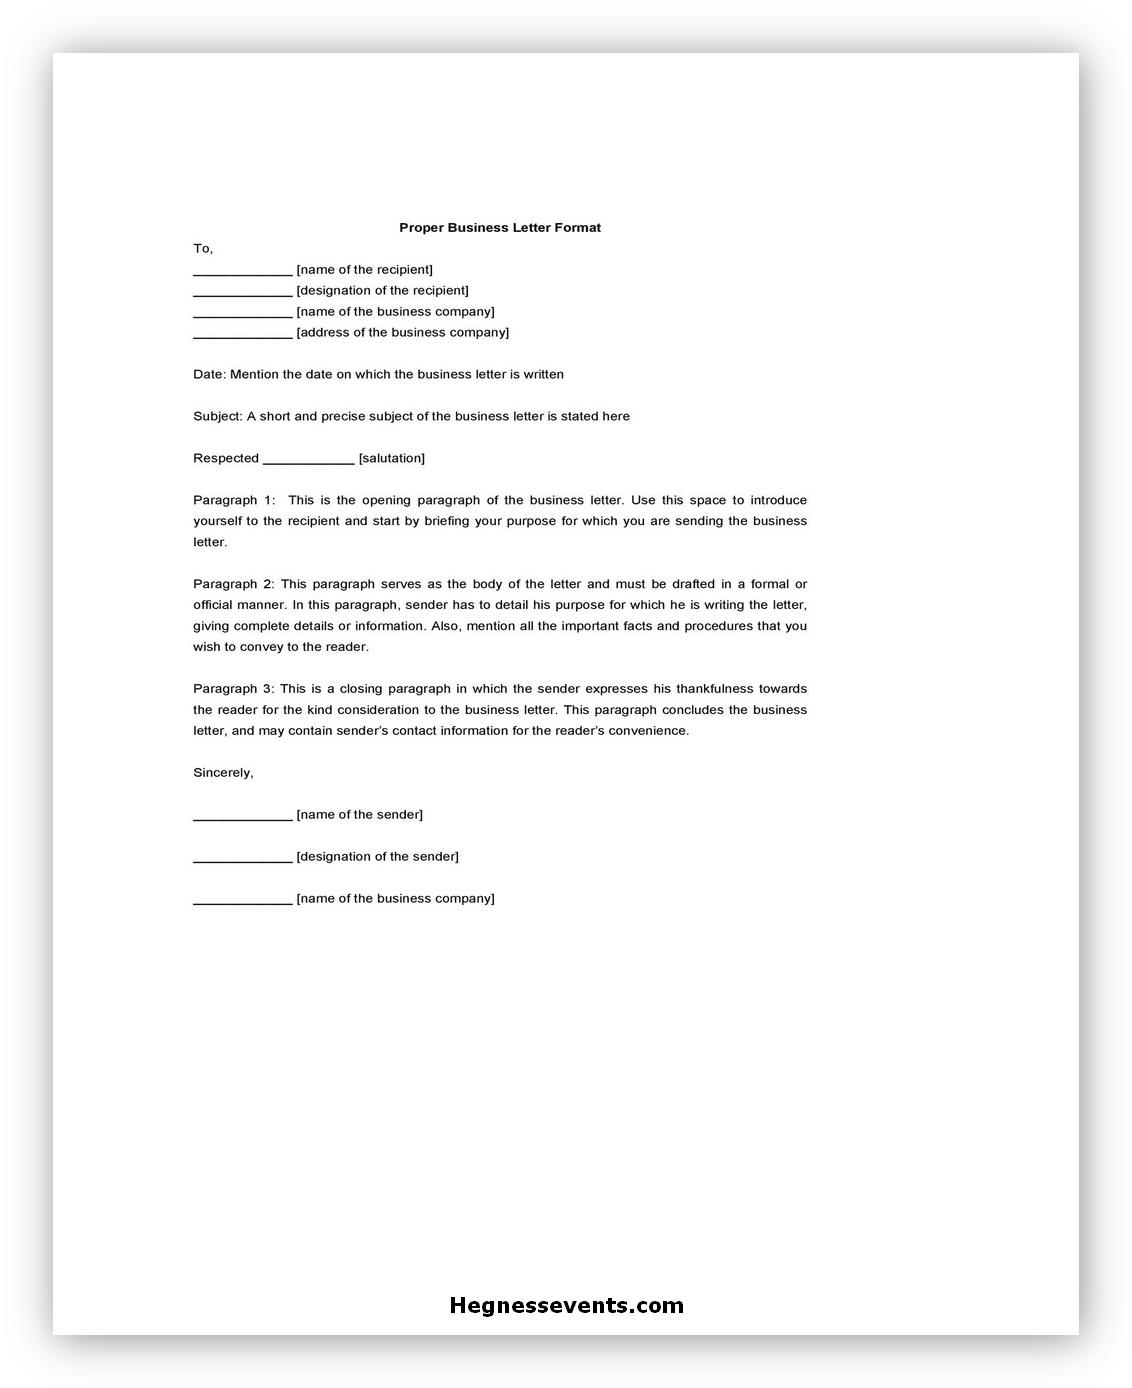 Business letter Format 02